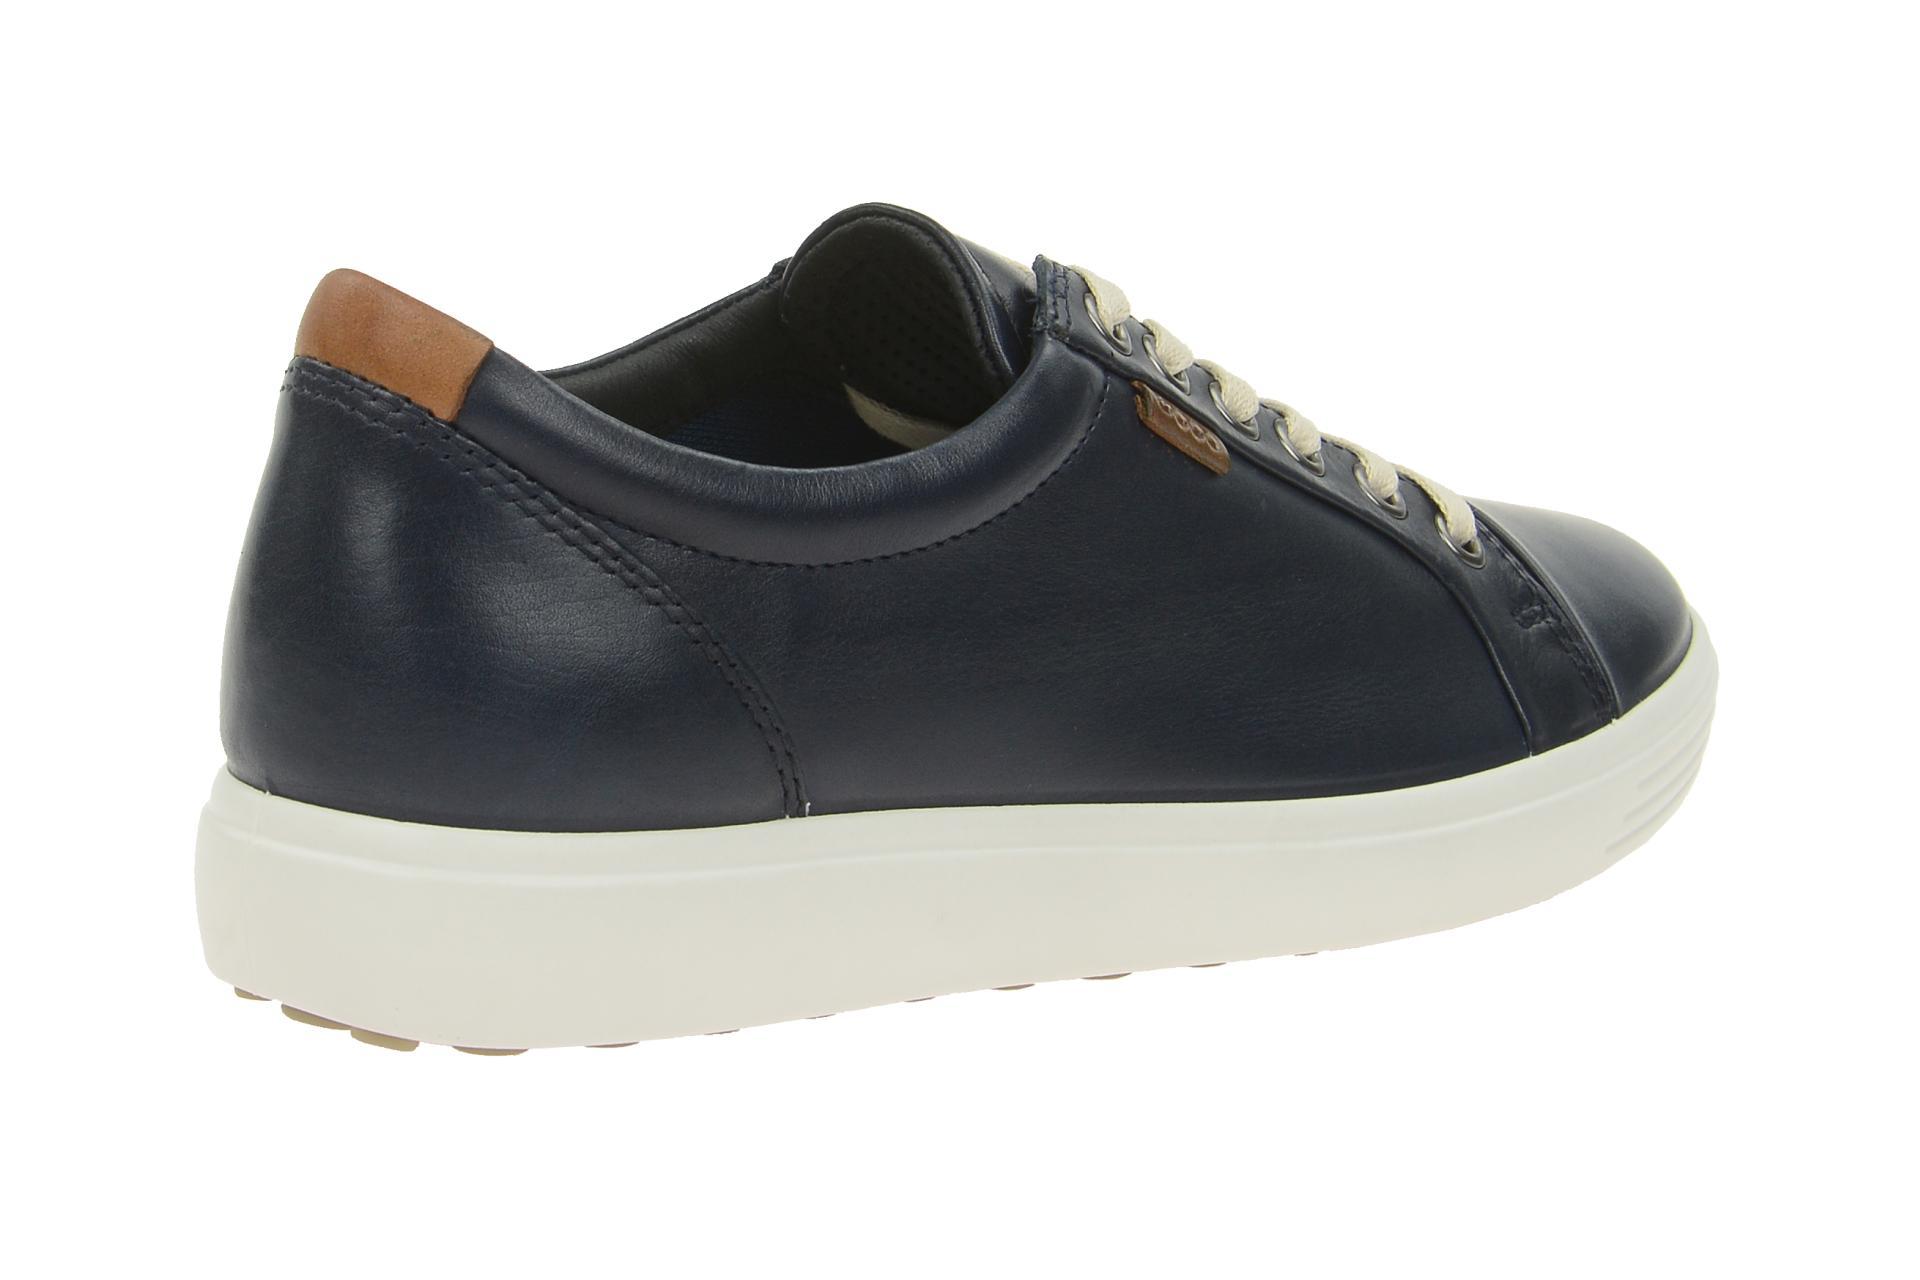 ecco soft 7 schuhe blau damen sneakers schuhhaus strauch. Black Bedroom Furniture Sets. Home Design Ideas